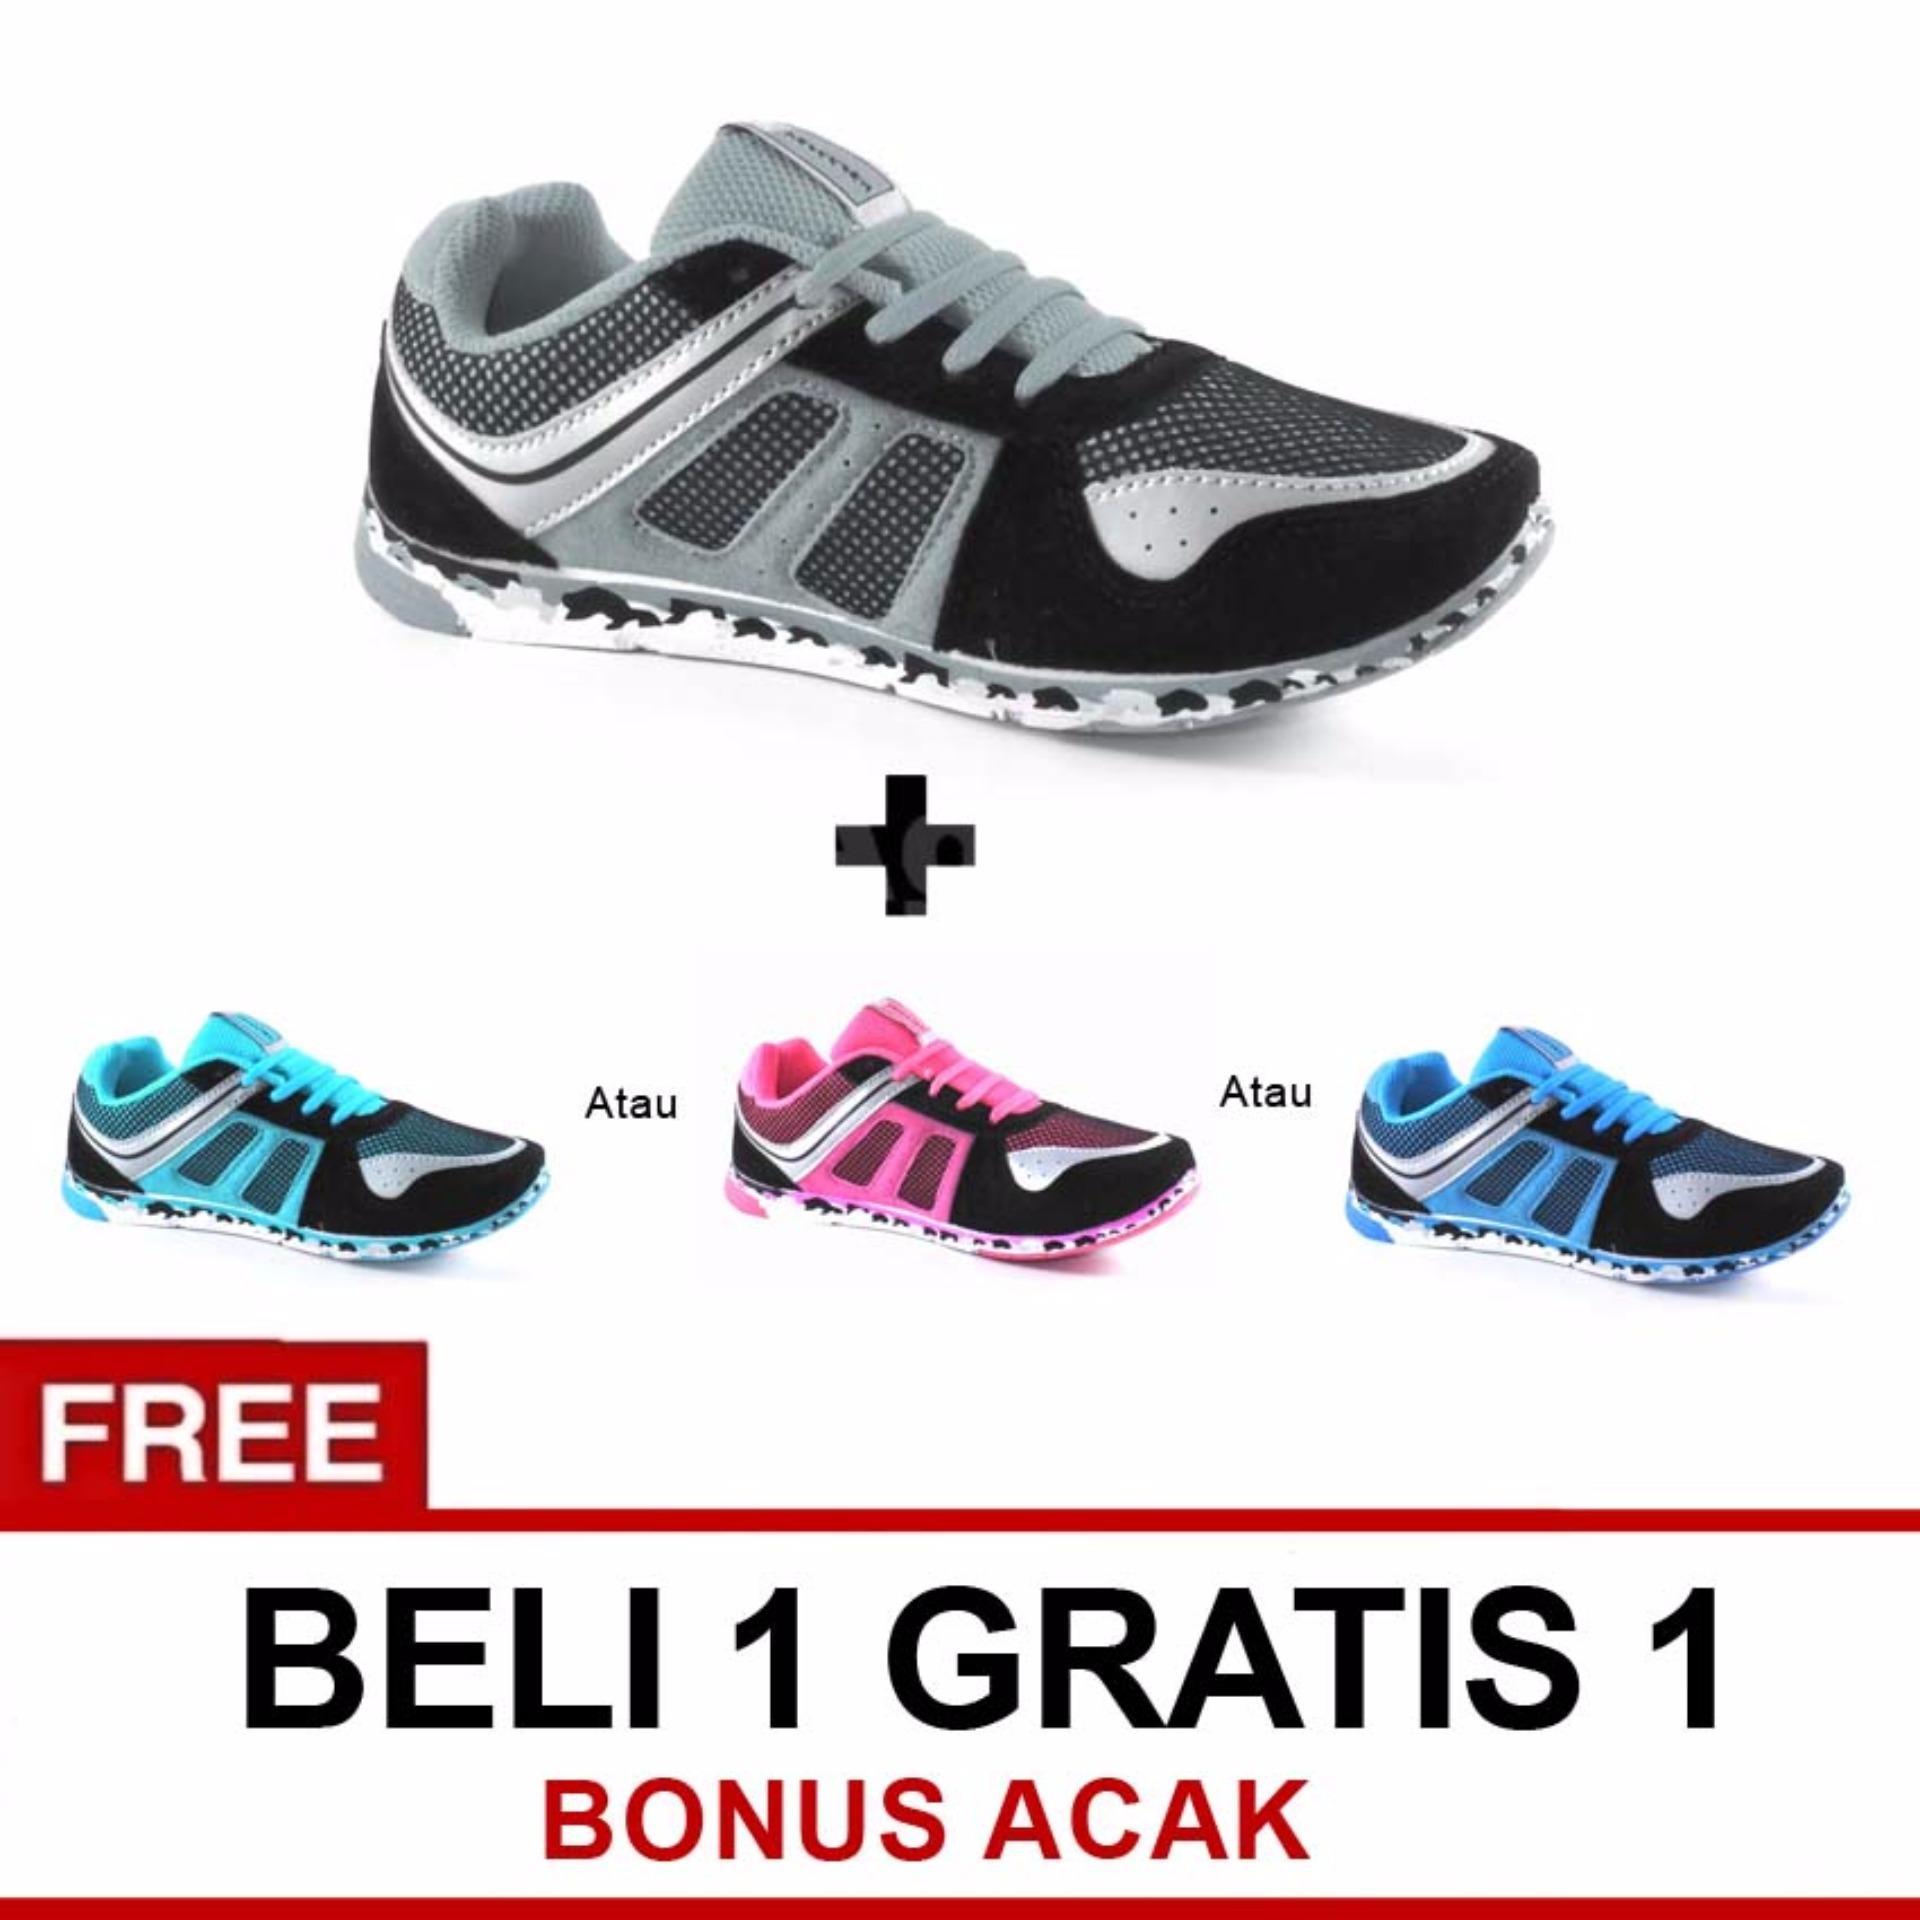 Jual Trekkers Jw Pisces Sepatu Olahraga Hitam Abu Tua Beli 1 Gratis 1 Random Trekkers Branded